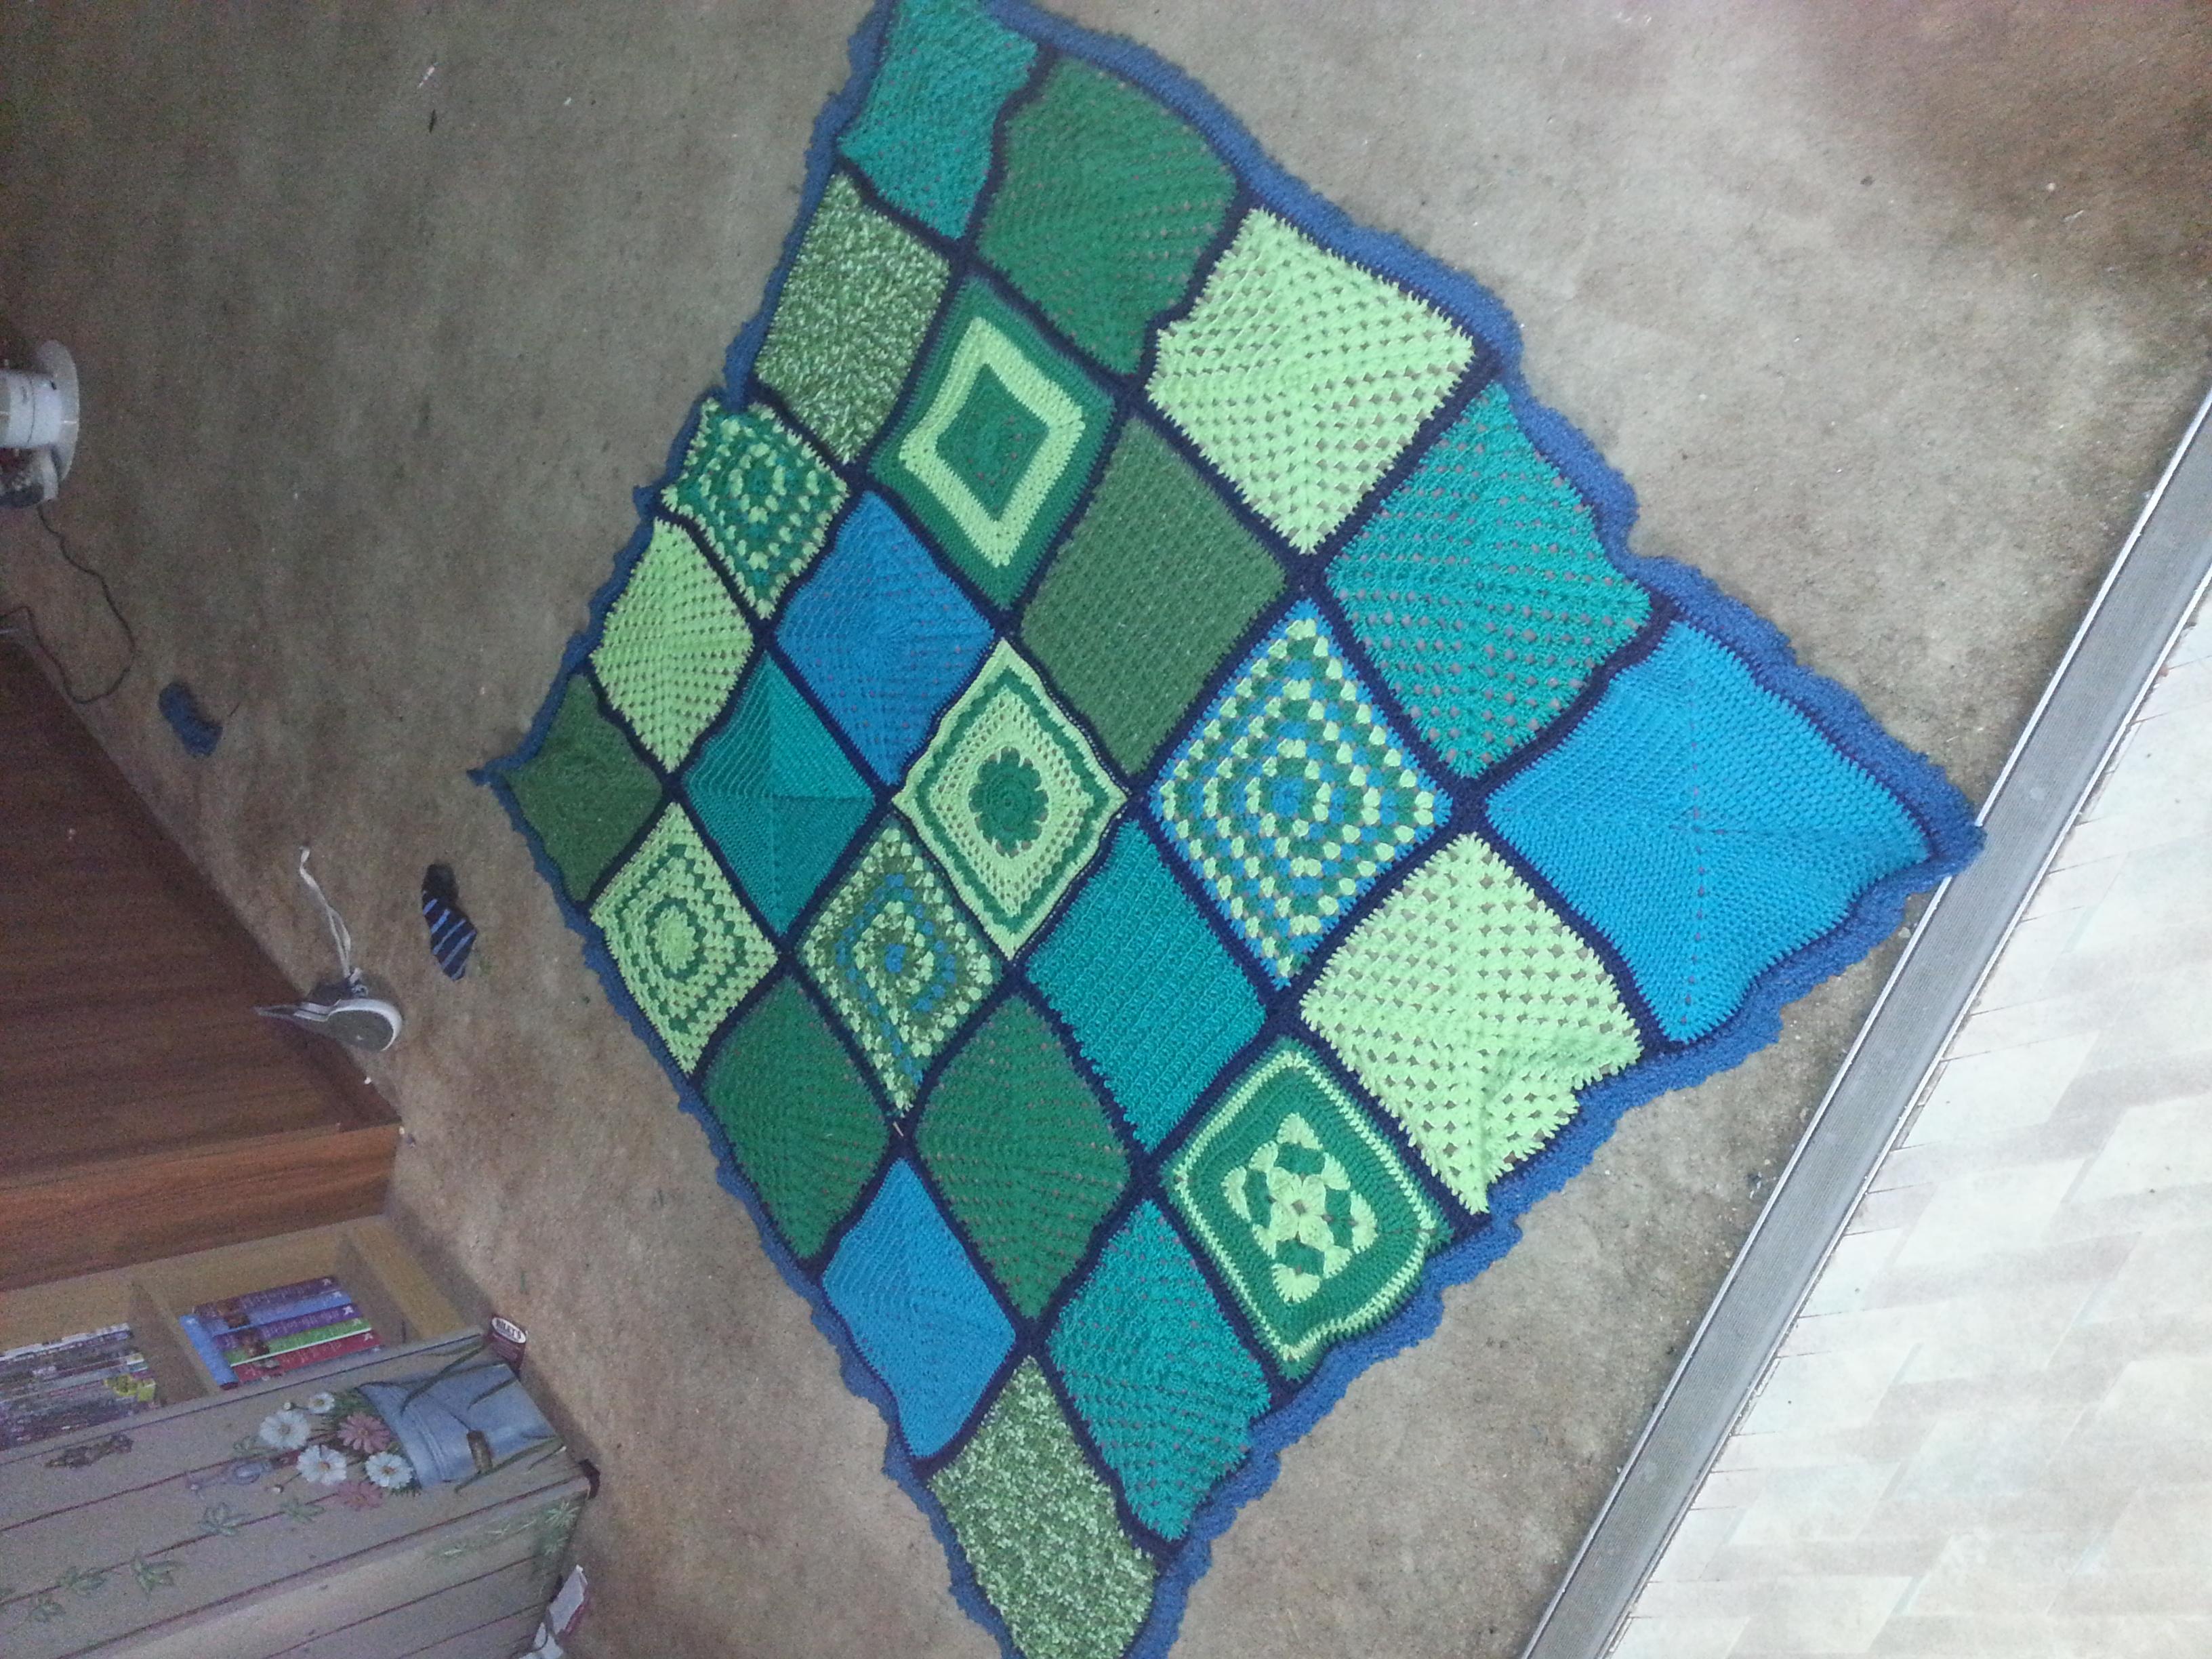 The blanket!